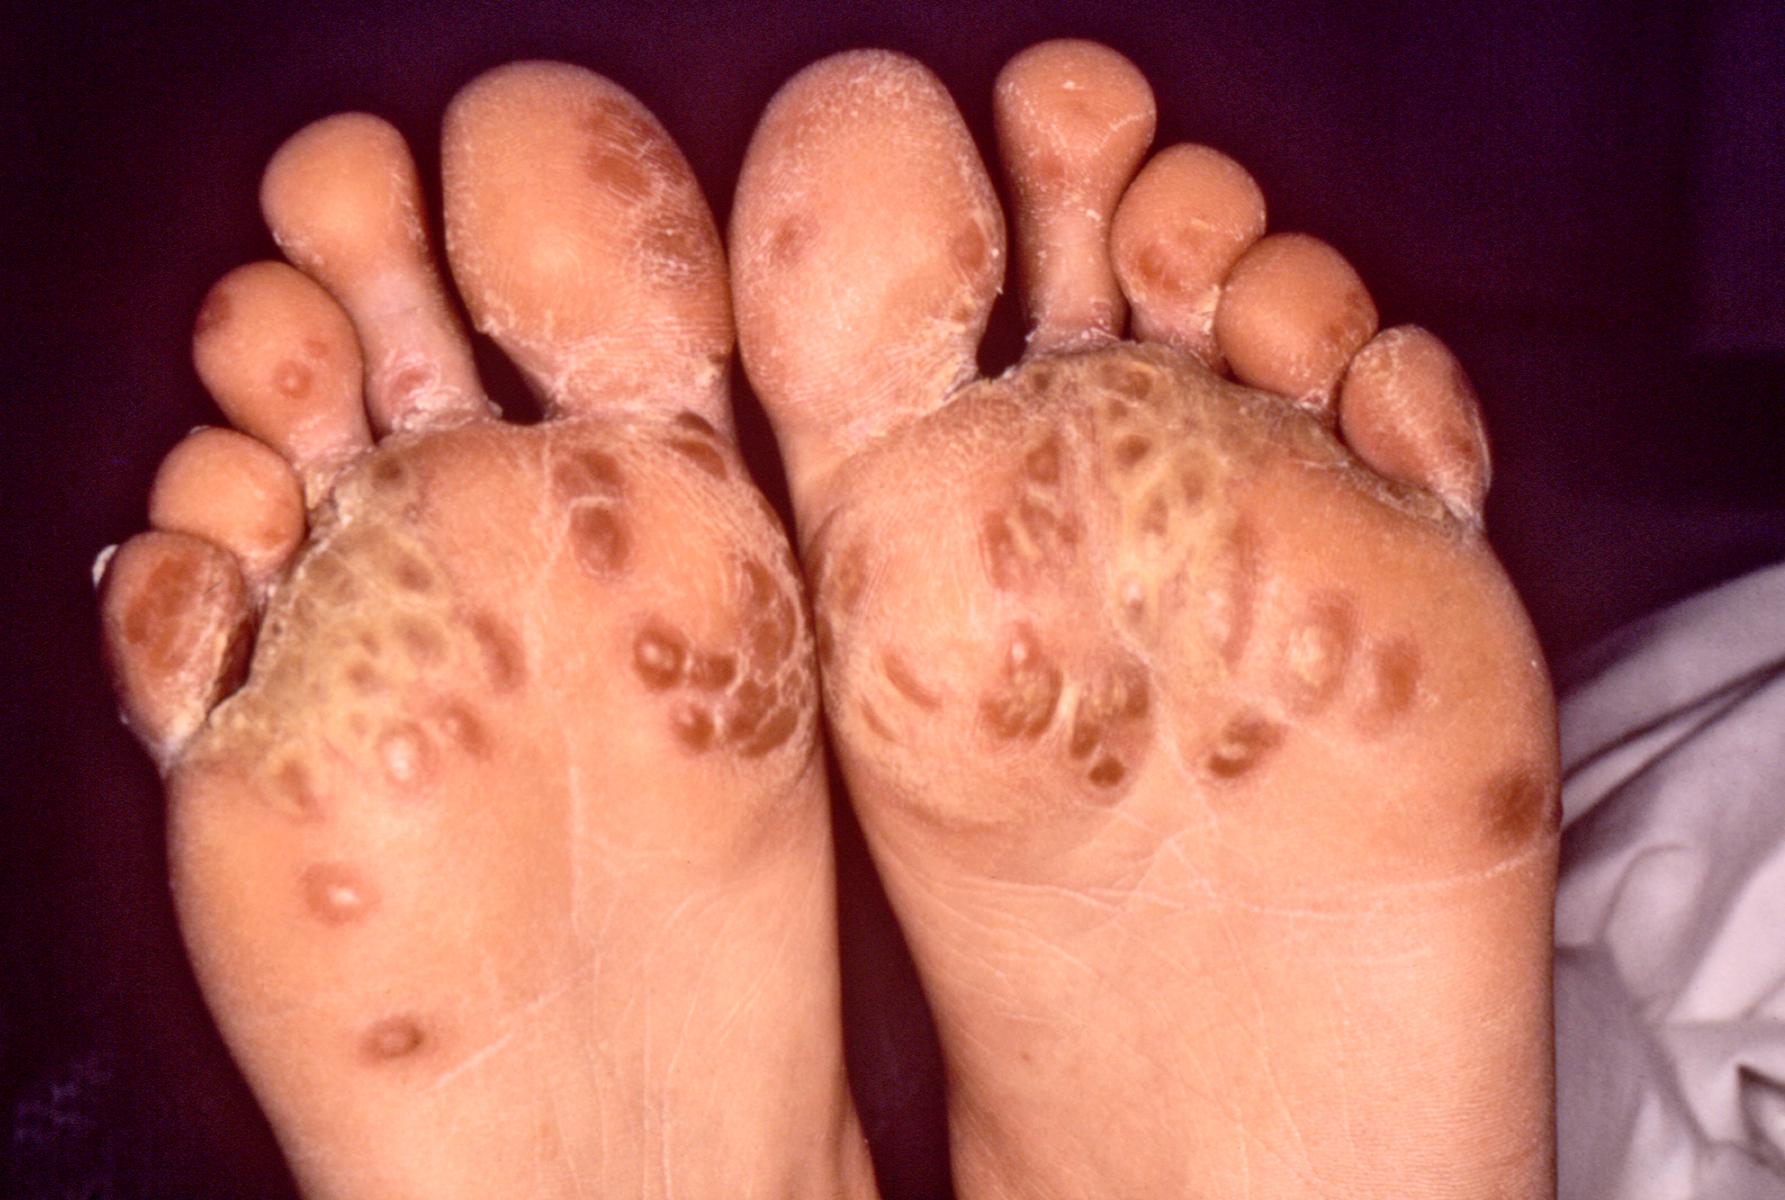 Ayurvedic medicine licence, chlamydia symptoms nz, kill herpes virus